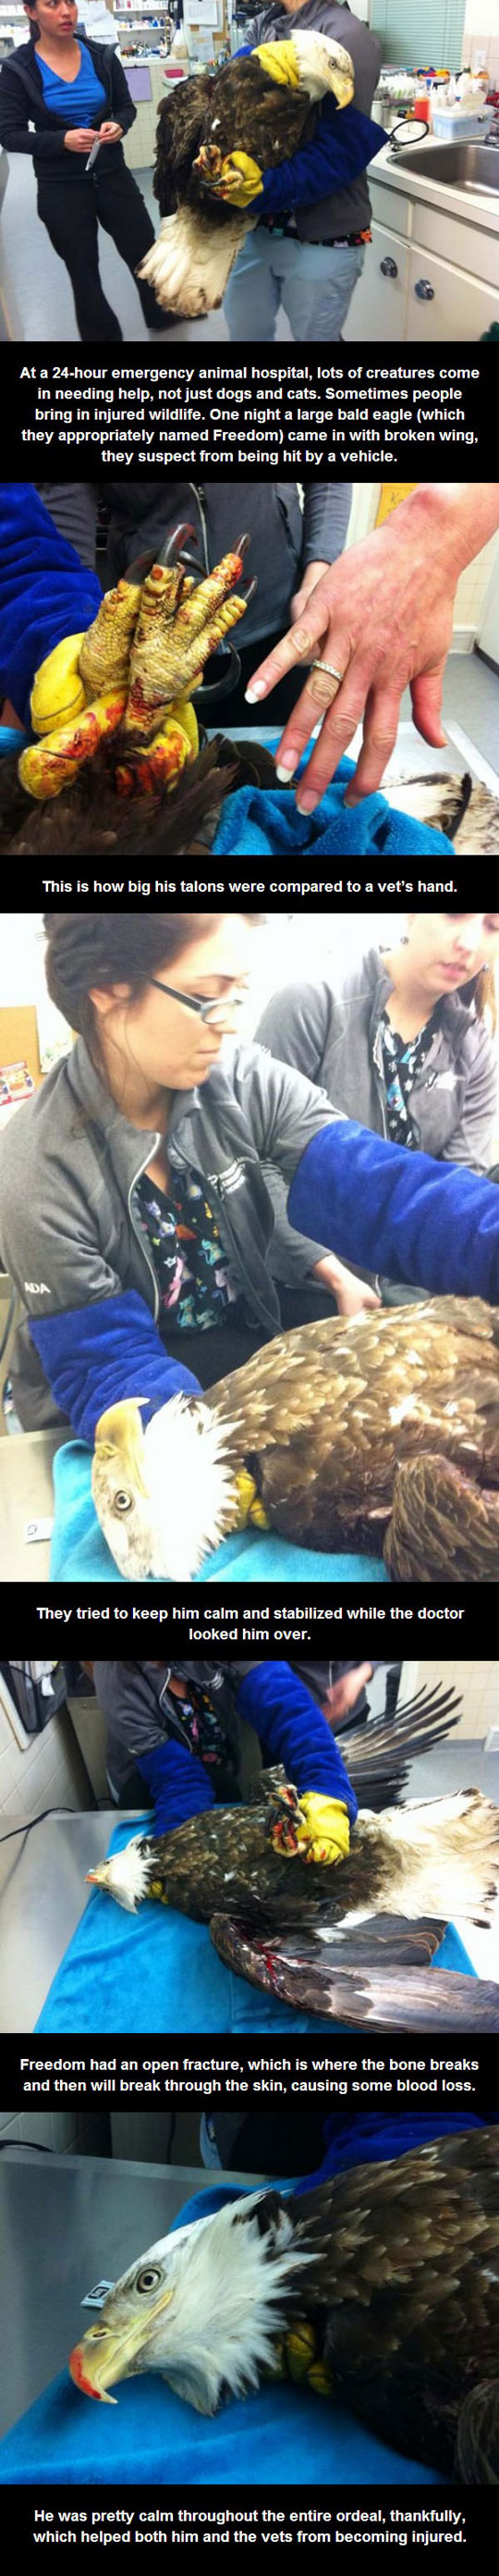 A Bald Eagle Came Into The Animal Hospital